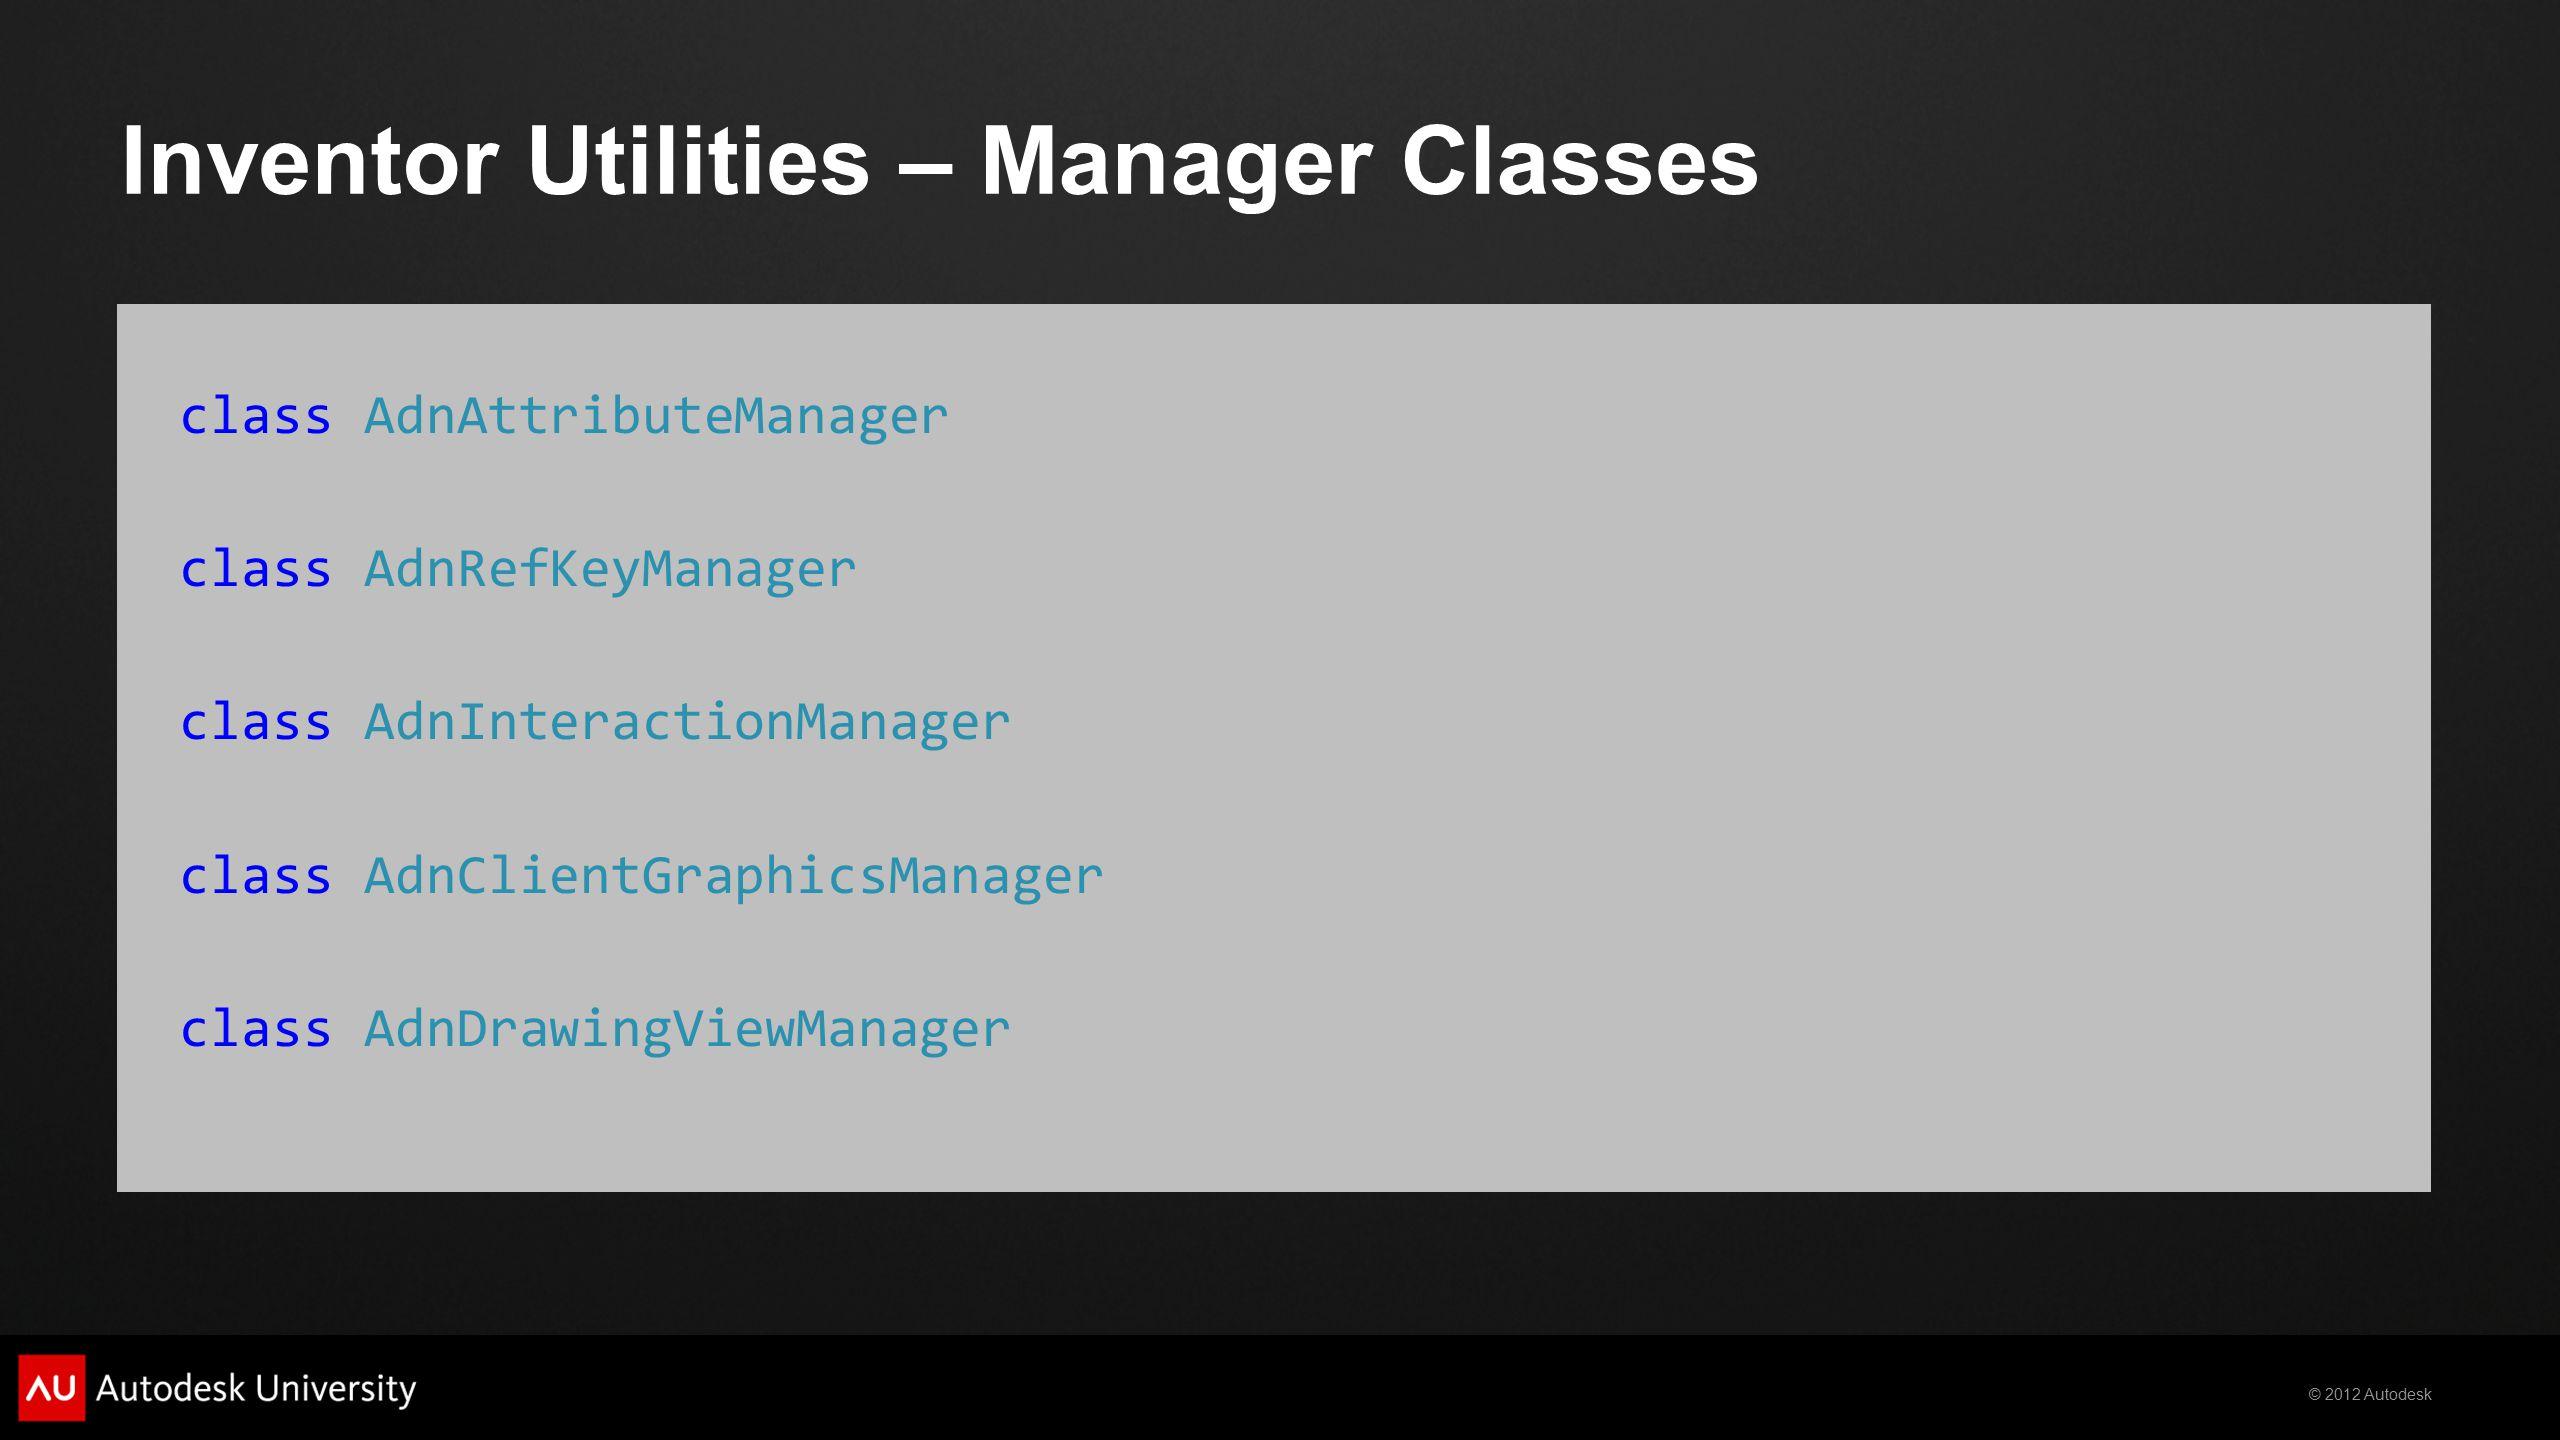 © 2012 Autodesk Inventor Utilities – Manager Classes class AdnAttributeManager class AdnRefKeyManager class AdnInteractionManager class AdnClientGraph